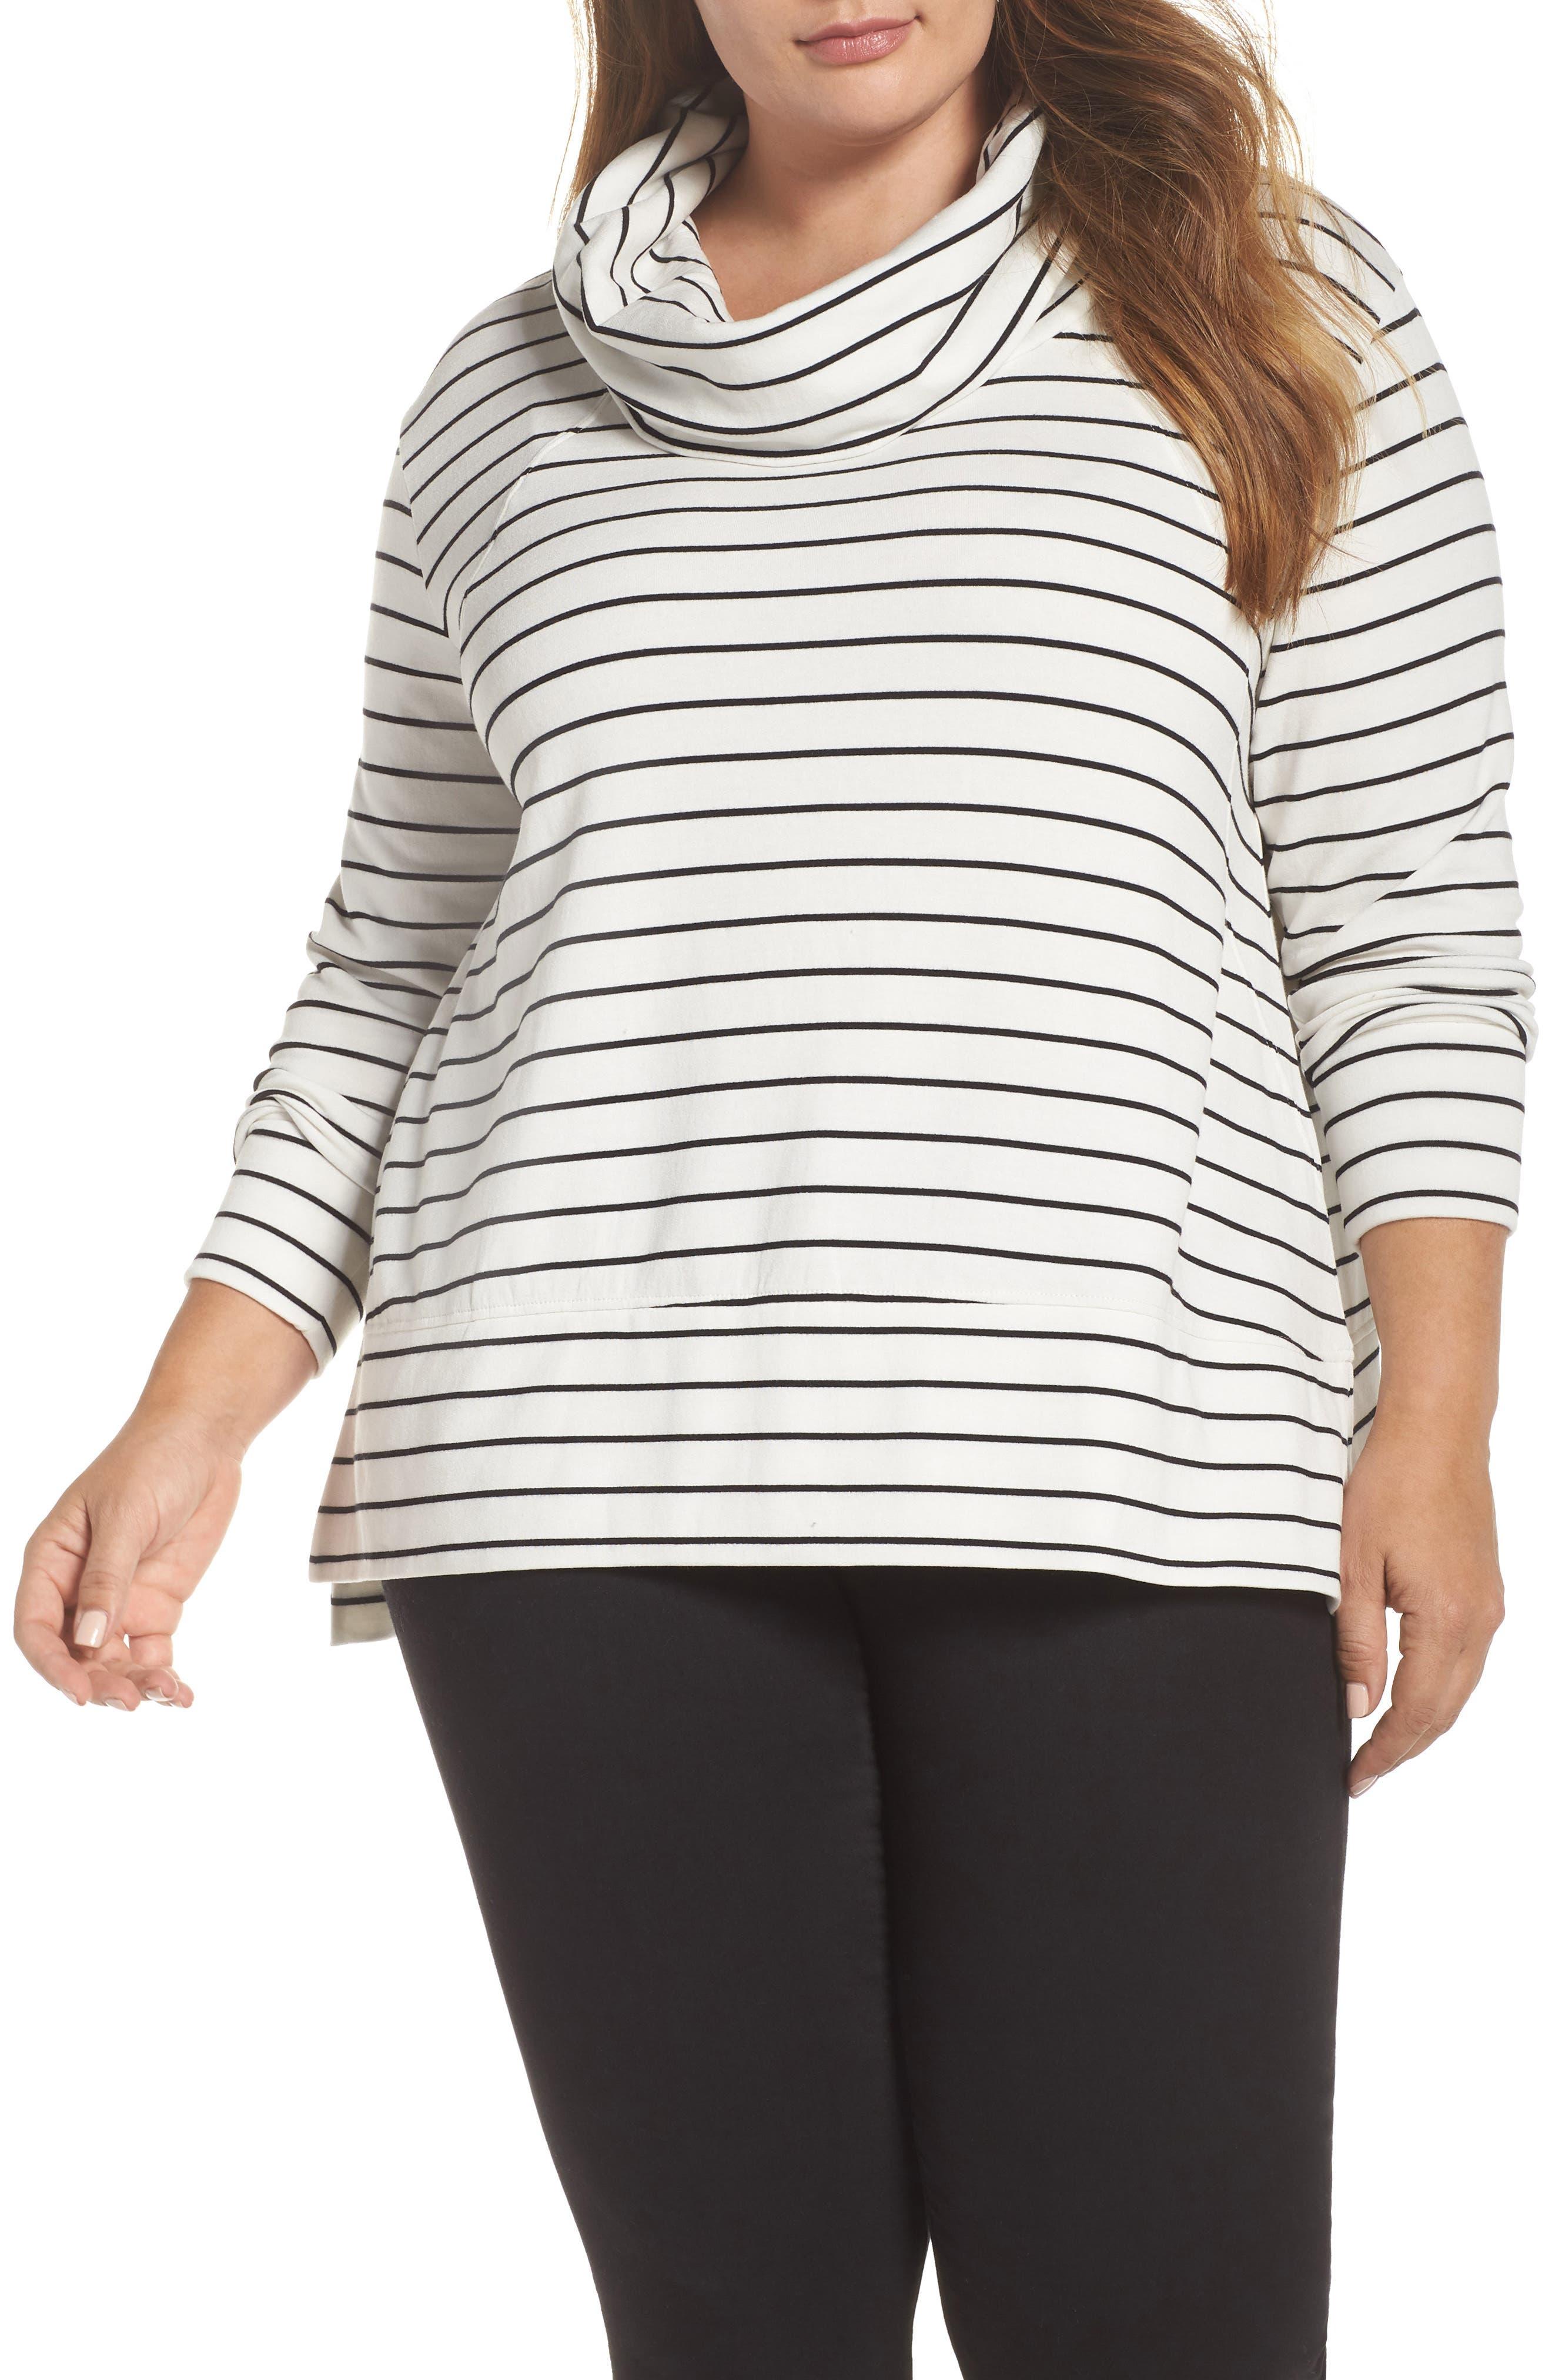 Cowl Neck Tunic Sweatshirt,                             Main thumbnail 1, color,                             IVORY- BLACK LUKAH STRIPE